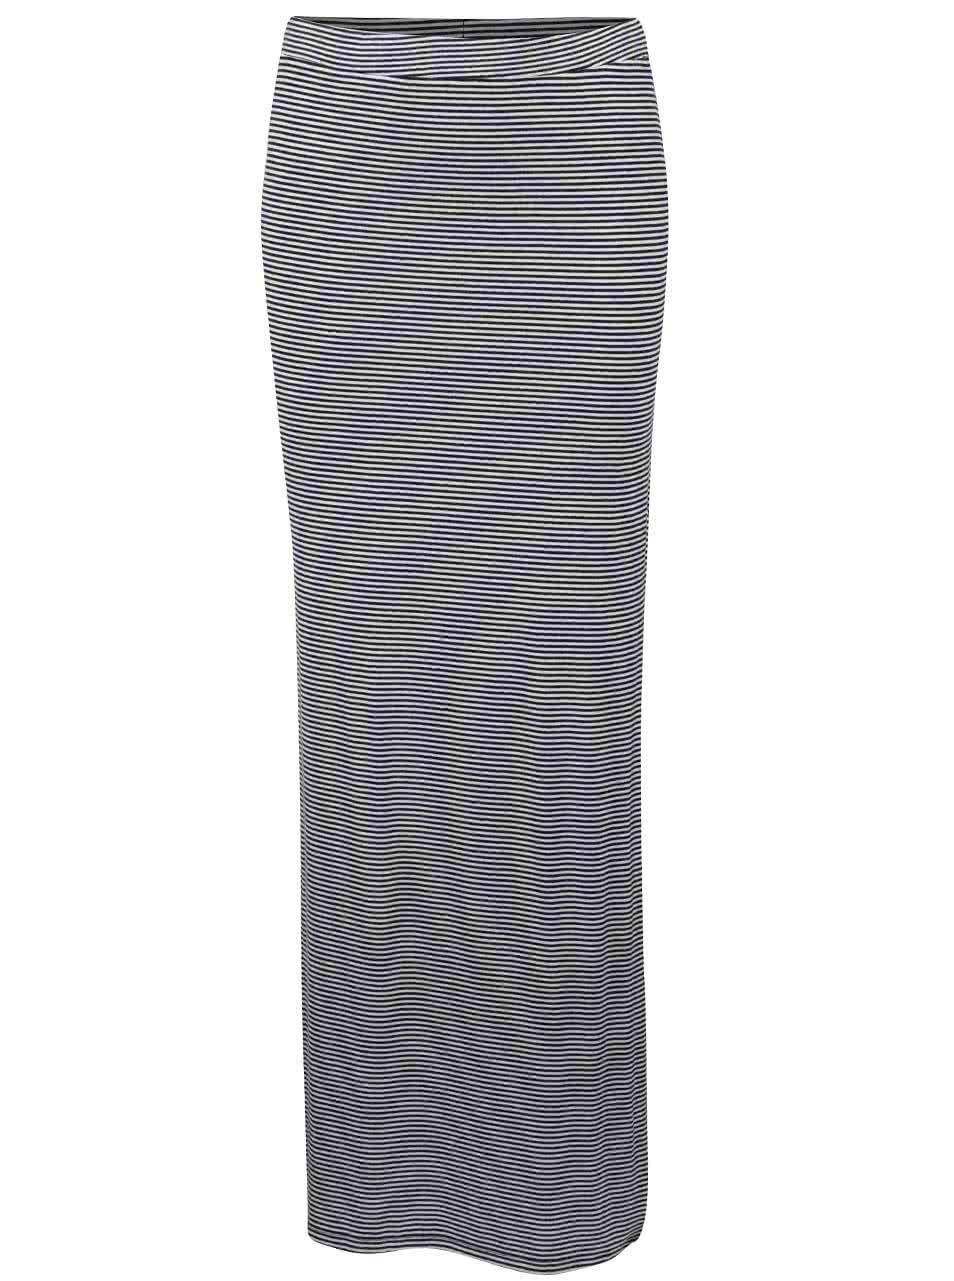 842a0b433509 Čierno-biela dlhá sukňa s pruhmi a rozparkami TALLY WEiJL ...